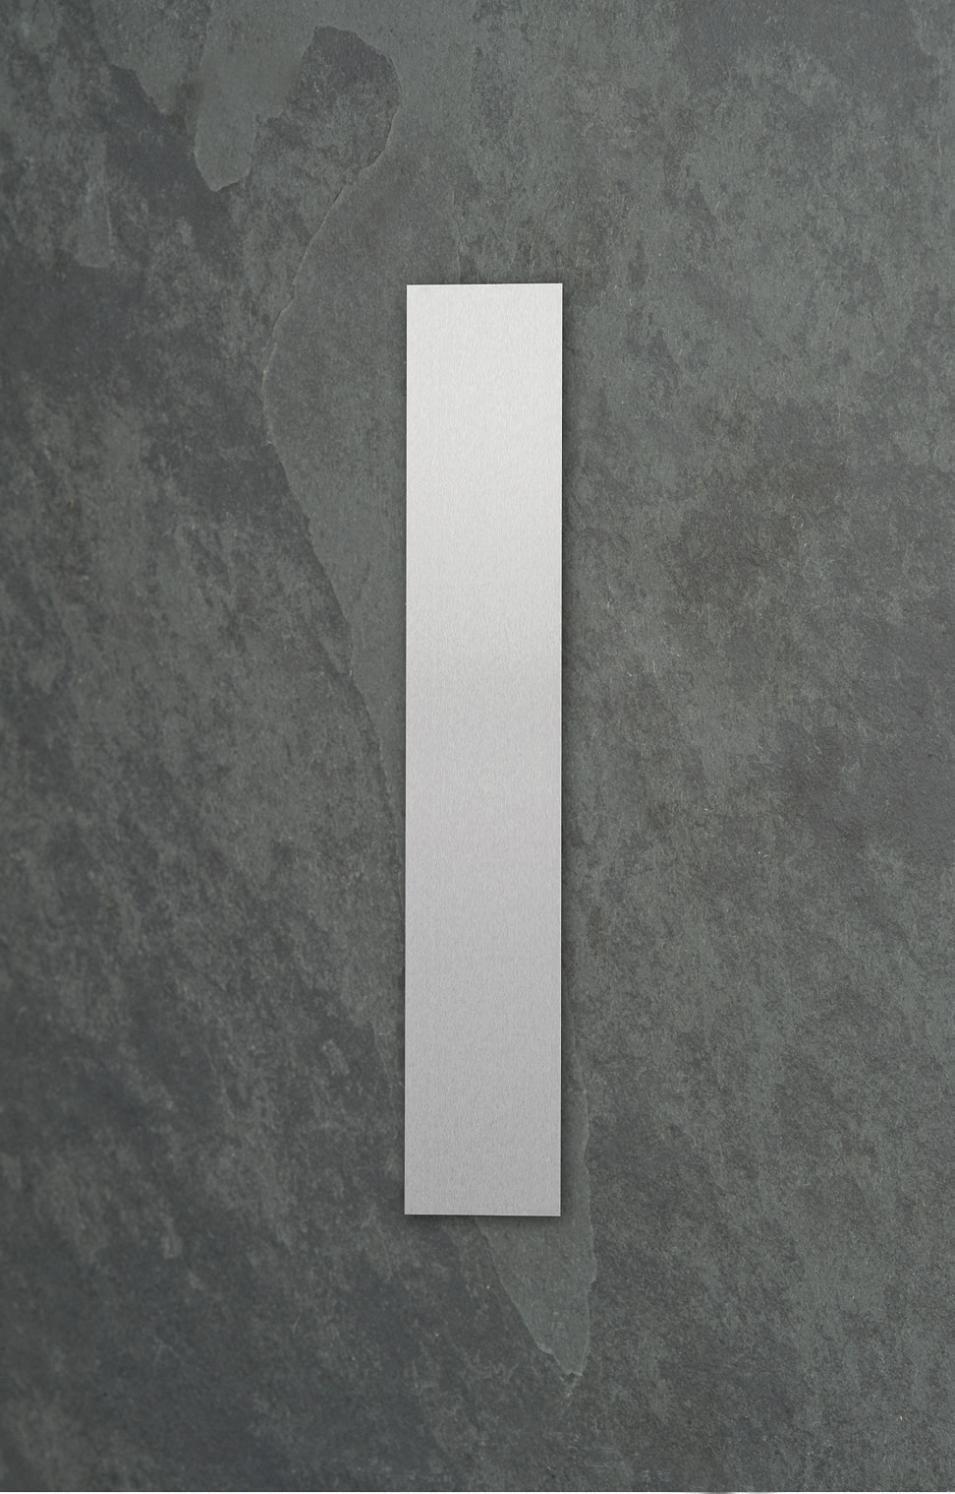 ASPP001/101 - ASSA ABLOY Push Plate